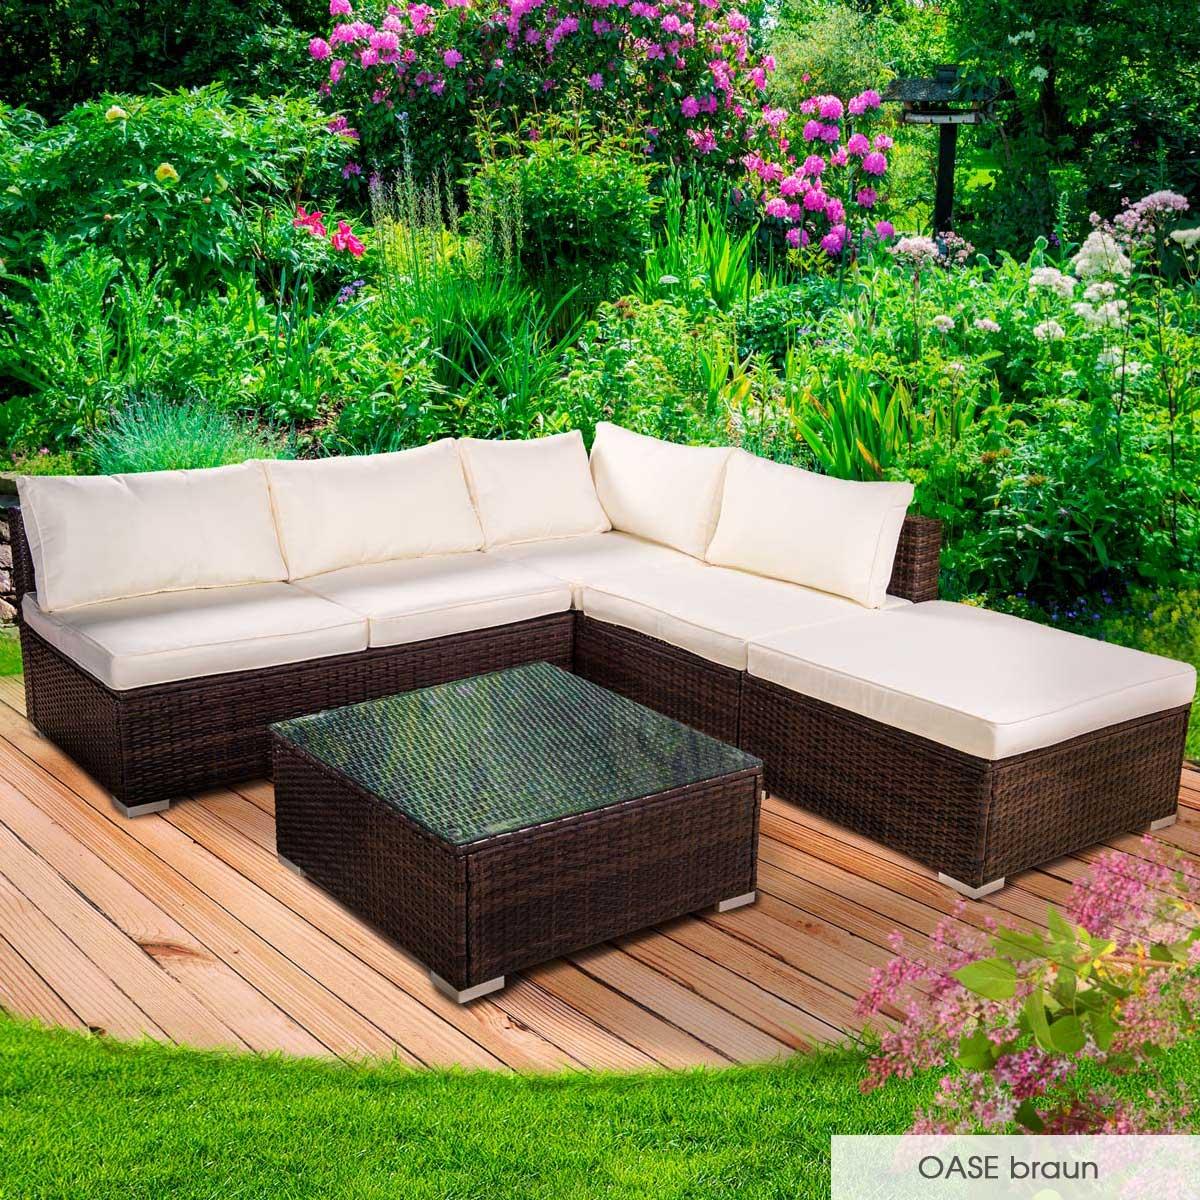 Gartenmoebel-Poly-Rattan-Lounge-Moebel-Sitzgarnitur-Gartengarnitur-Sitzgruppe-Sofa Indexbild 17